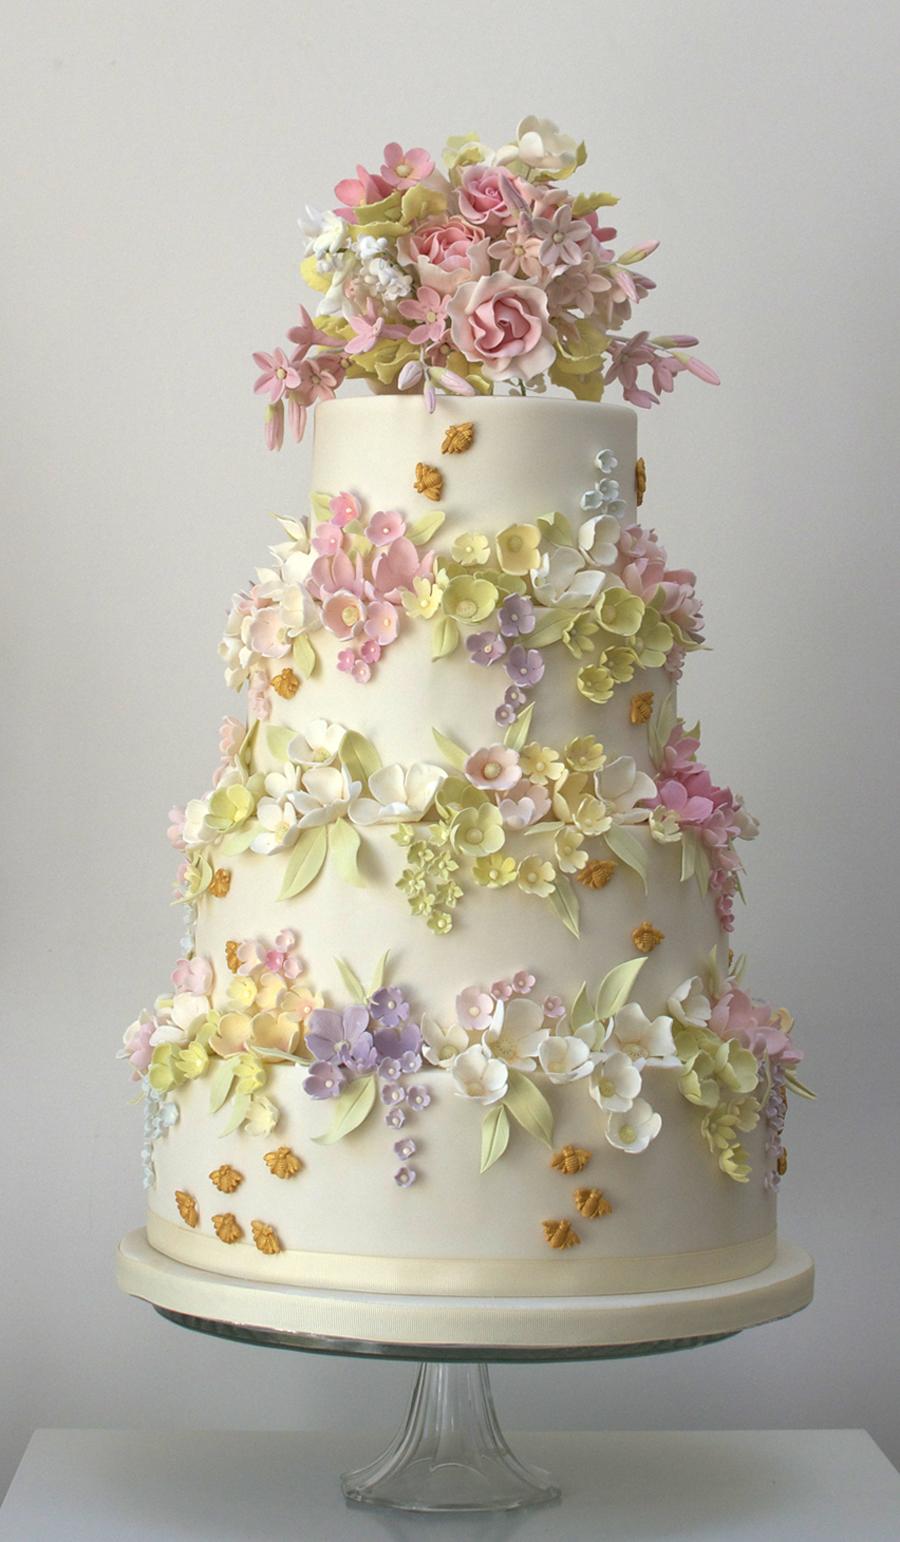 Rosalind Miller Cakes September 2012